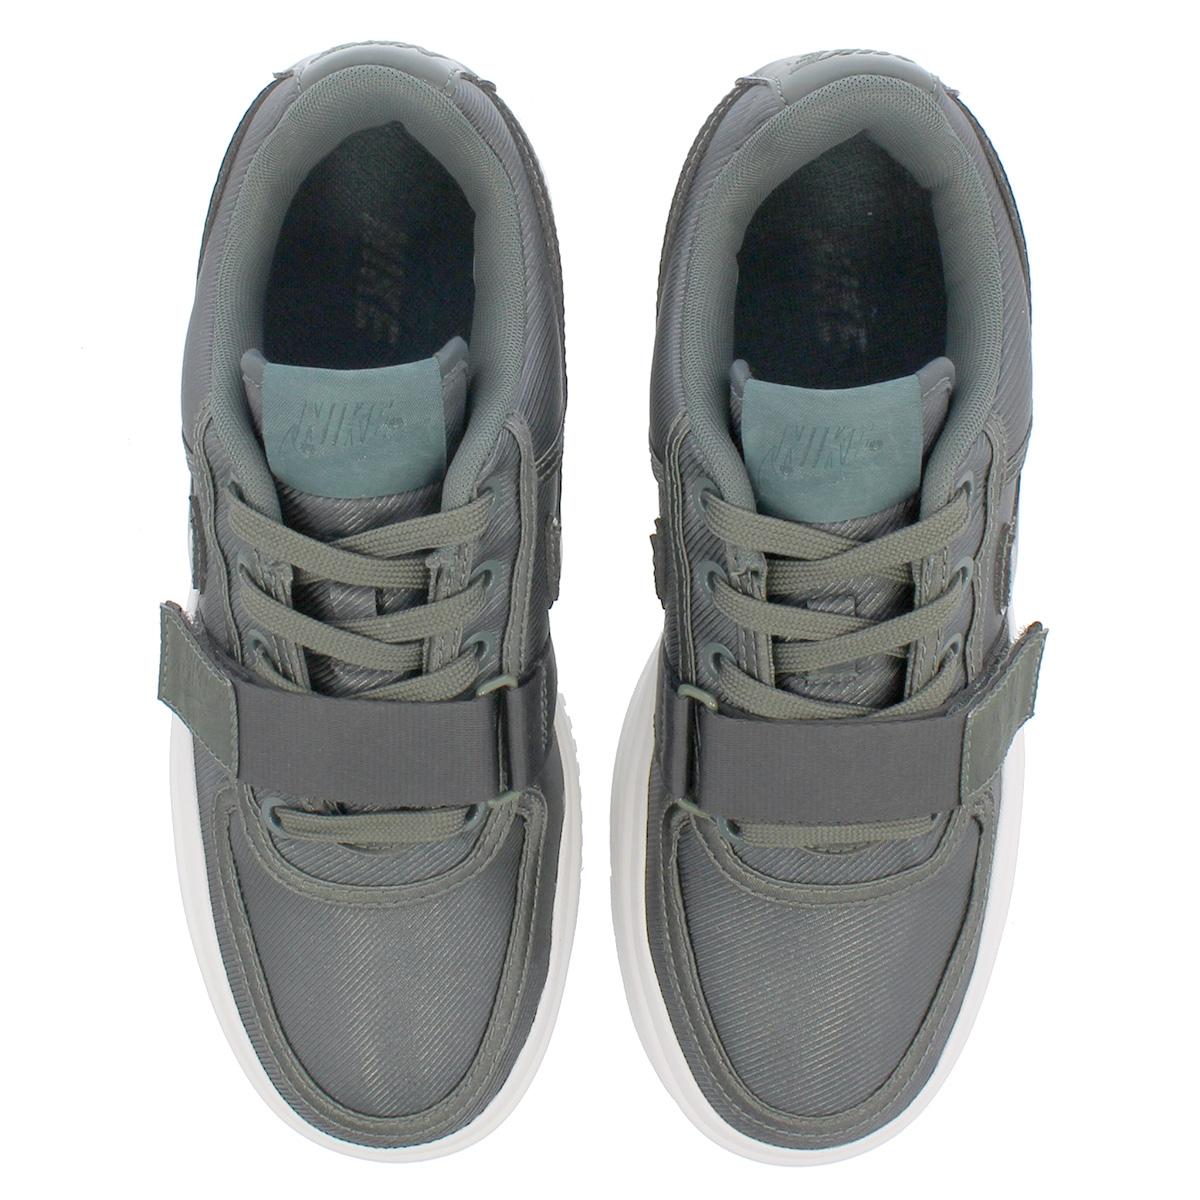 NIKE WMNS VANDAL 2K Nike women Vandal 2K MINERAL SPRUCE SUMMIT WHITE ao2868- 300 b856a509c